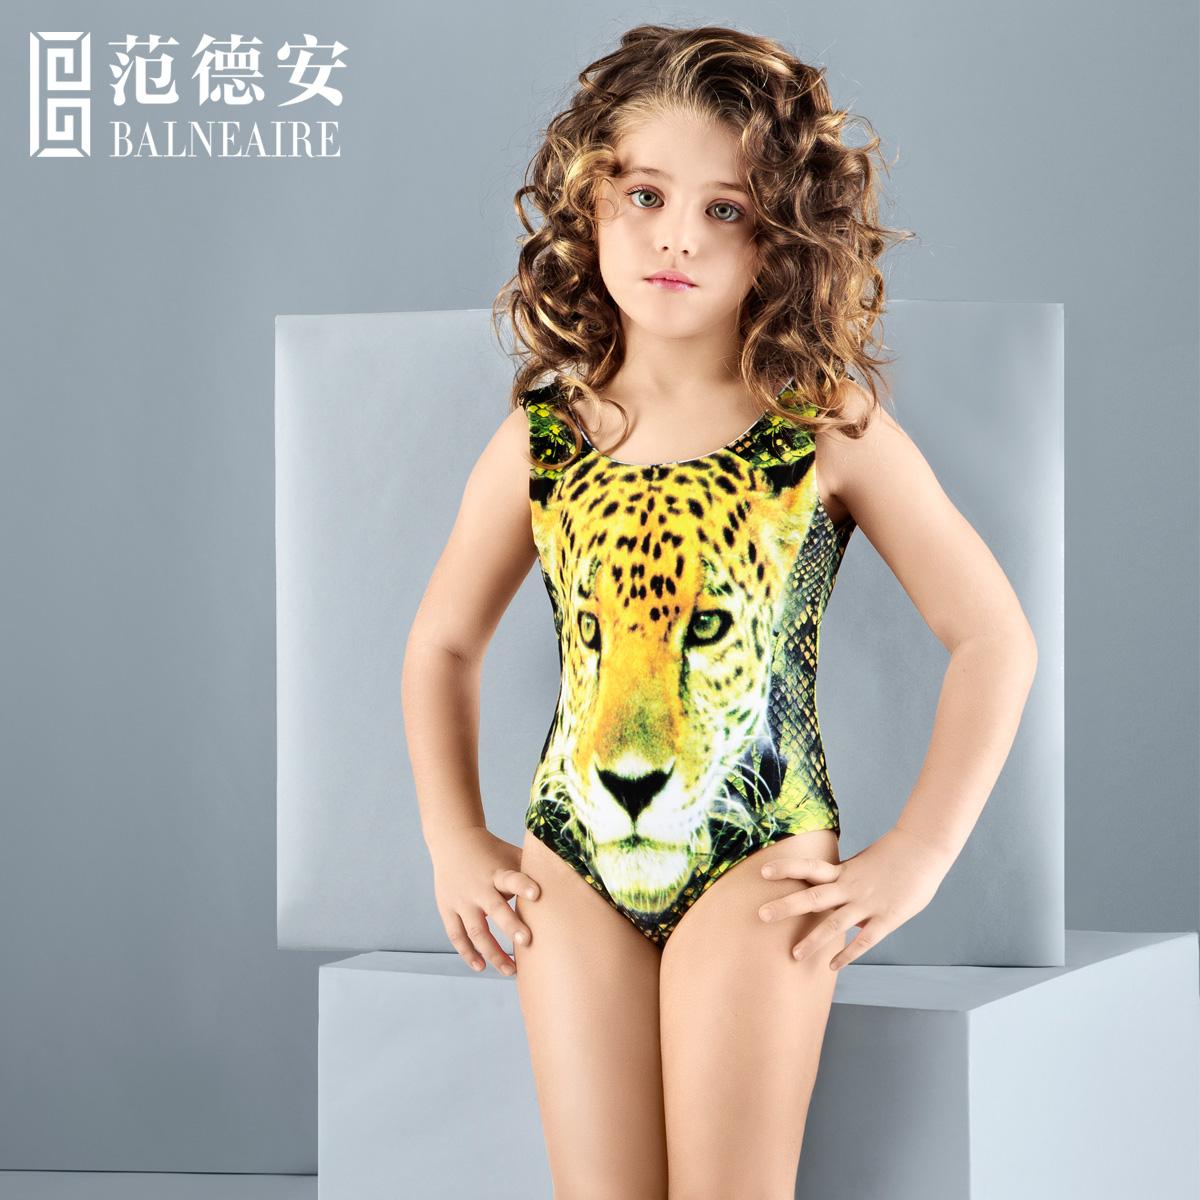 Childrens swimsuit Balneaire bk05y0010260001.